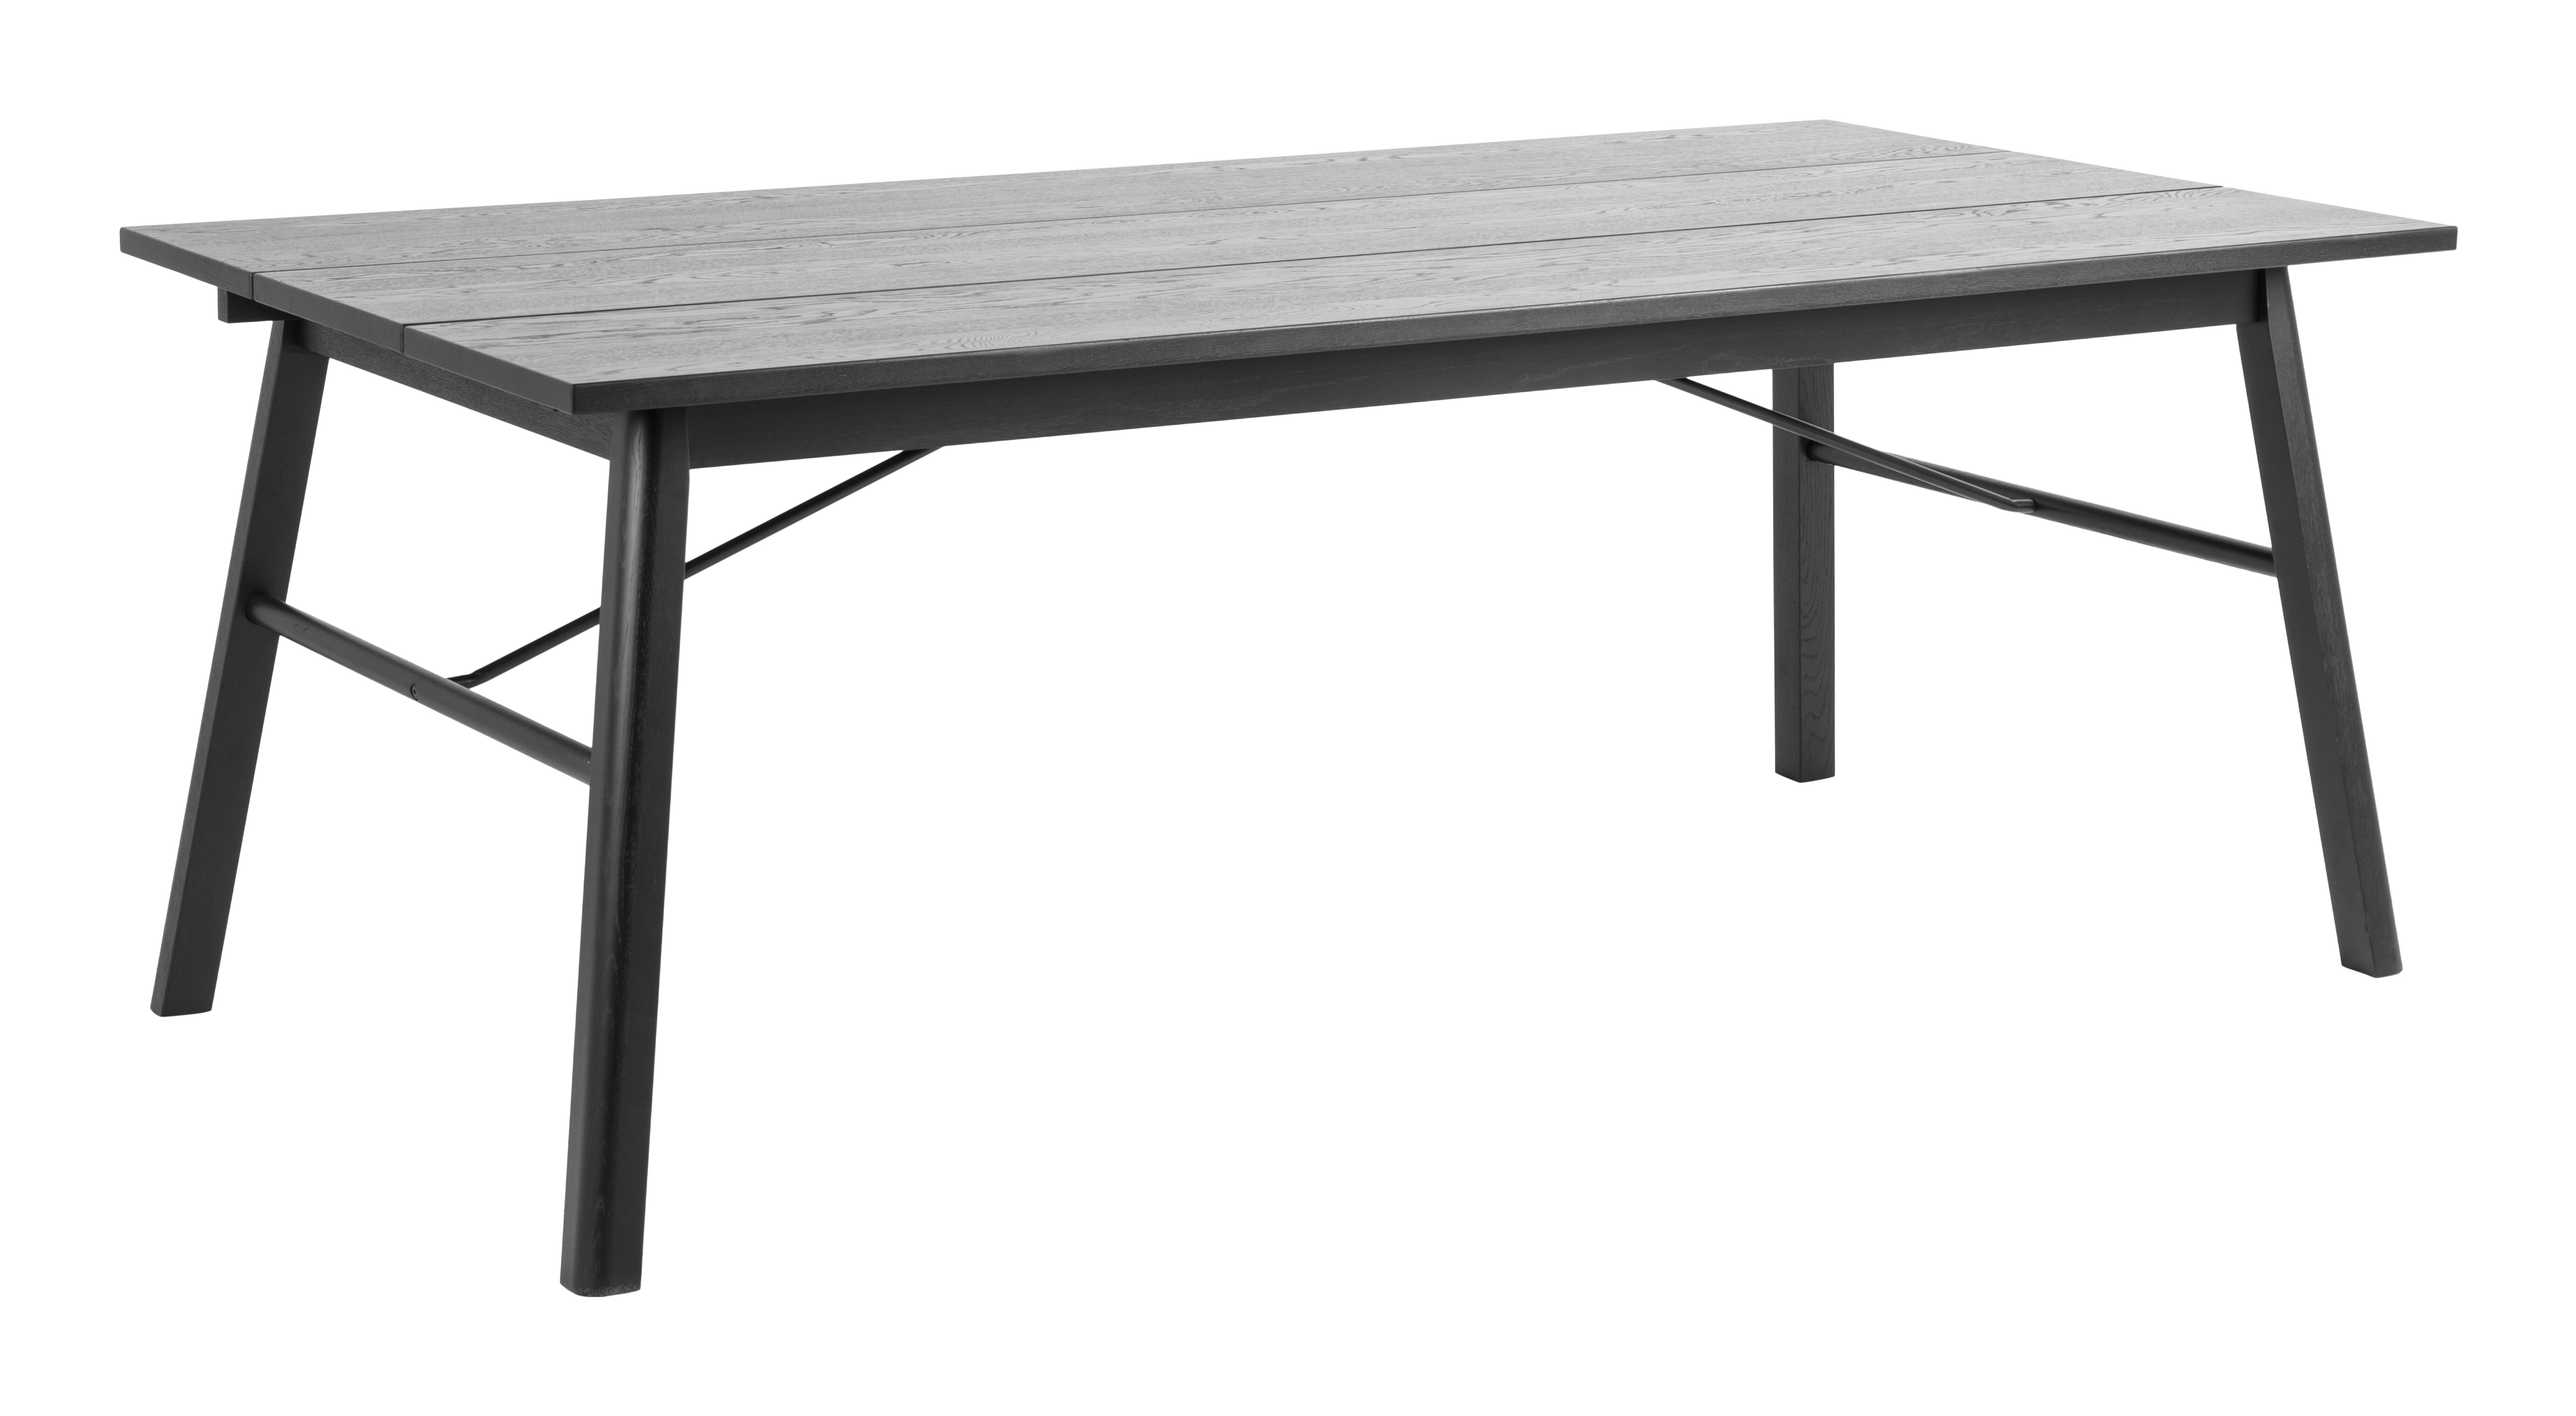 Interstil Eettafel 'Carver' 200 x 100cm